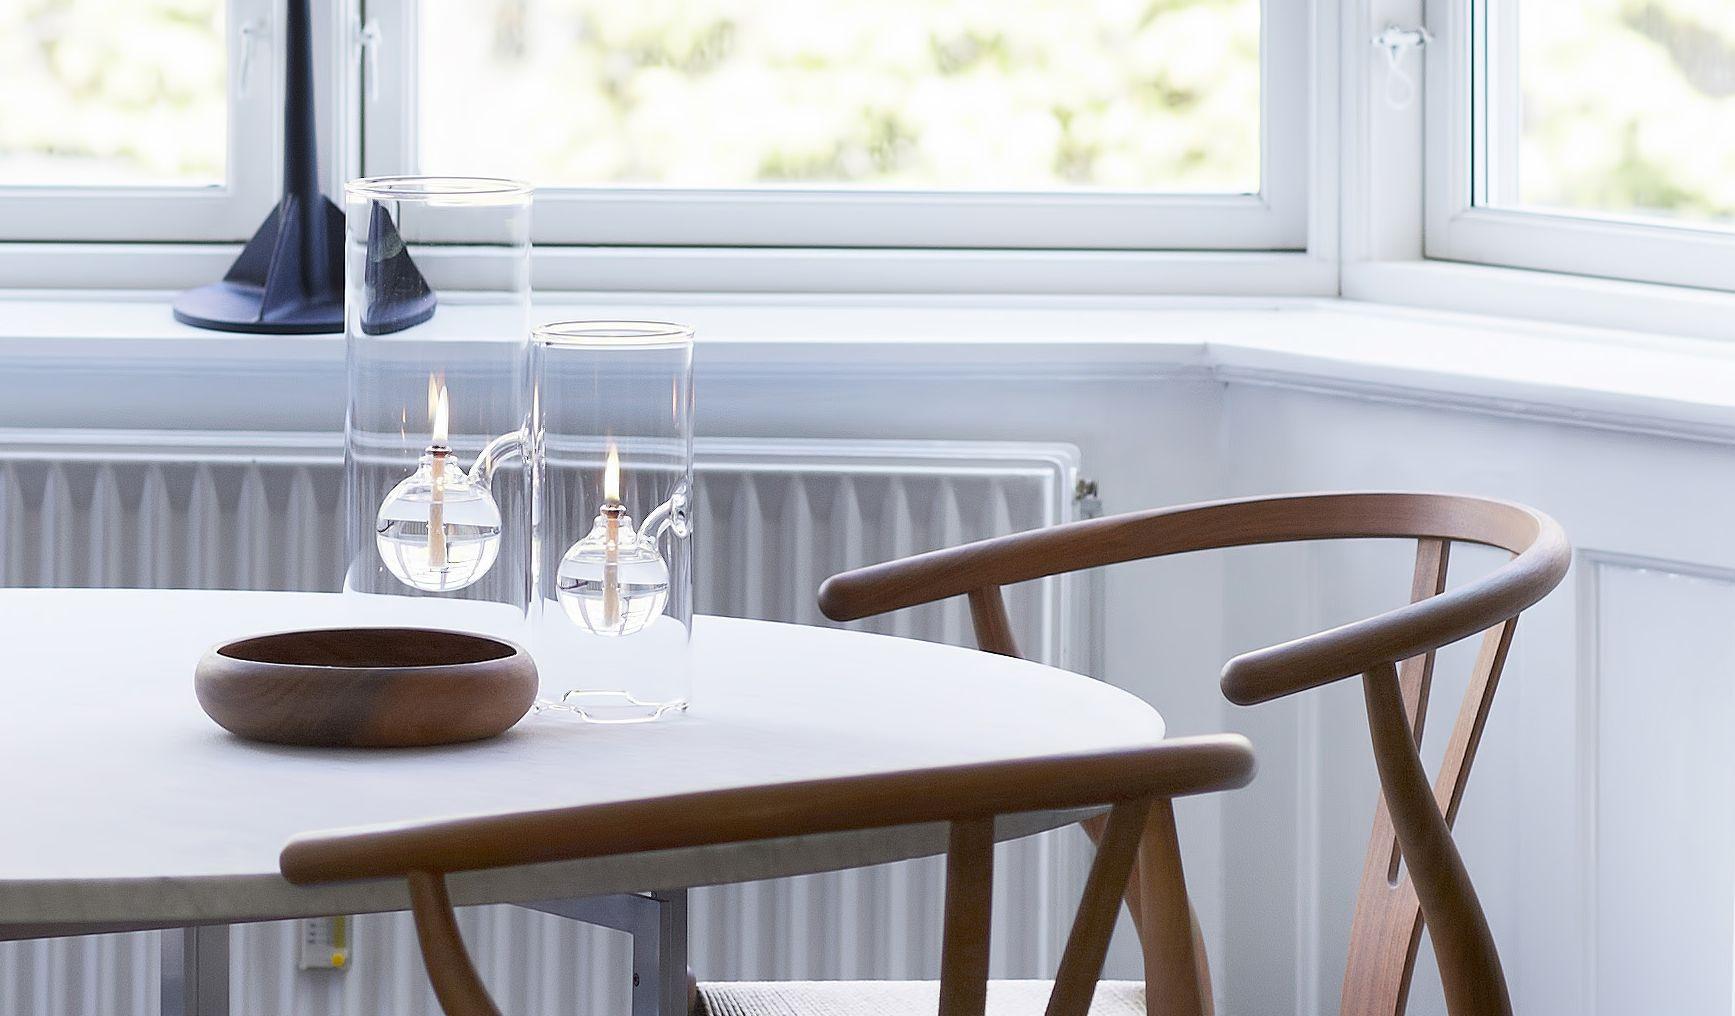 furniture poul kjaerholm pk54. wolfard oil lamps wishbone or y chair by hans wegner in walnut dining table poul kjrholm with white marble from greenland furniture kjaerholm pk54